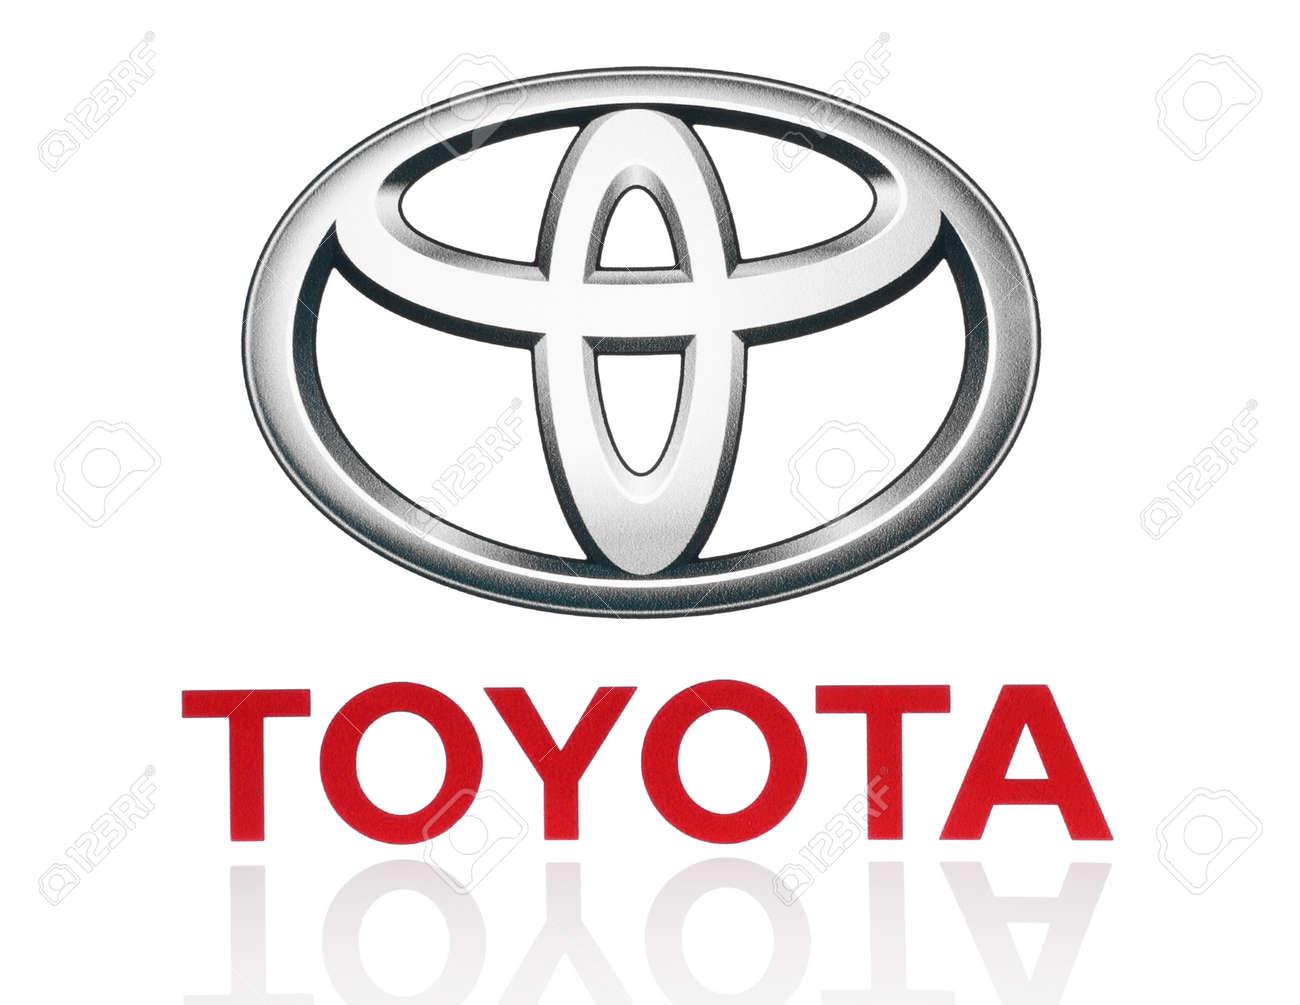 Toyota motor corporation ticker symbol best toyota series 2018 stock symbol for toyota motor corporation impremedia buycottarizona Gallery